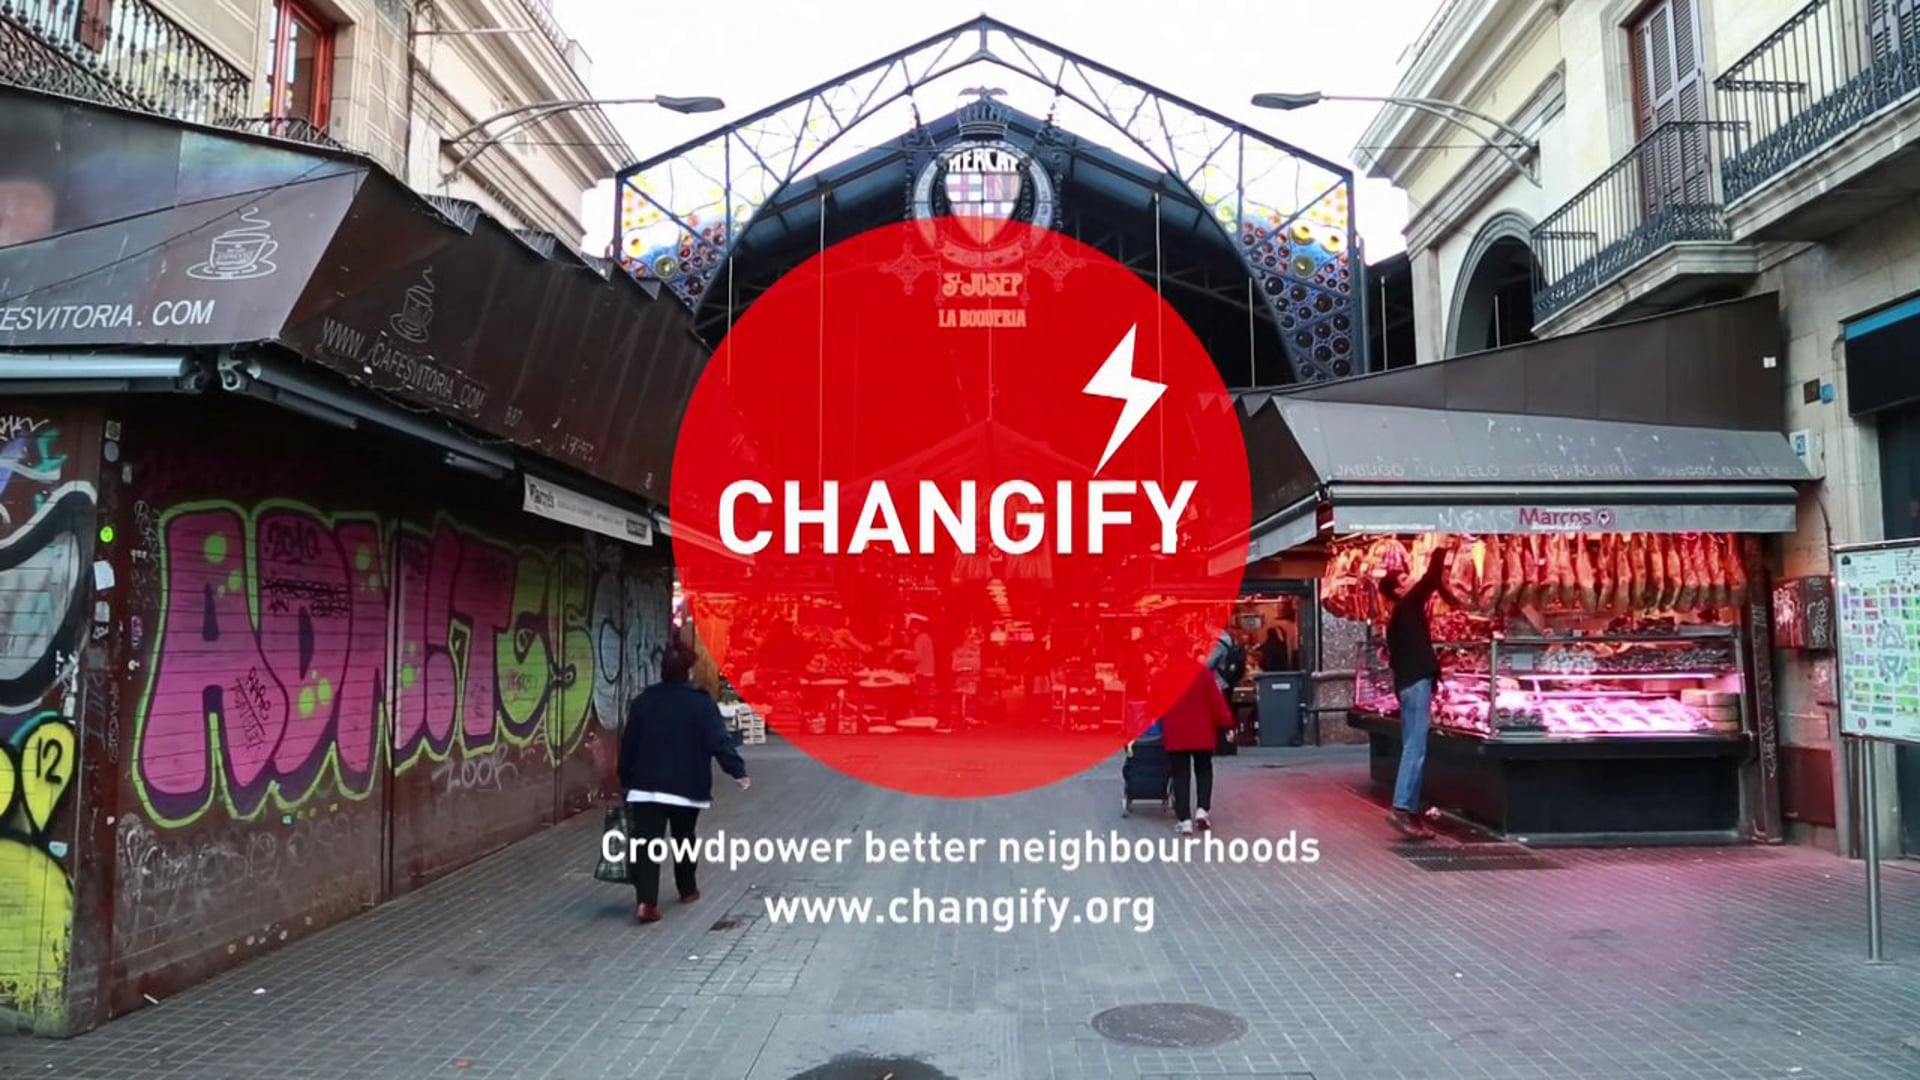 Changify.org / Crowdpower better neighborhoods